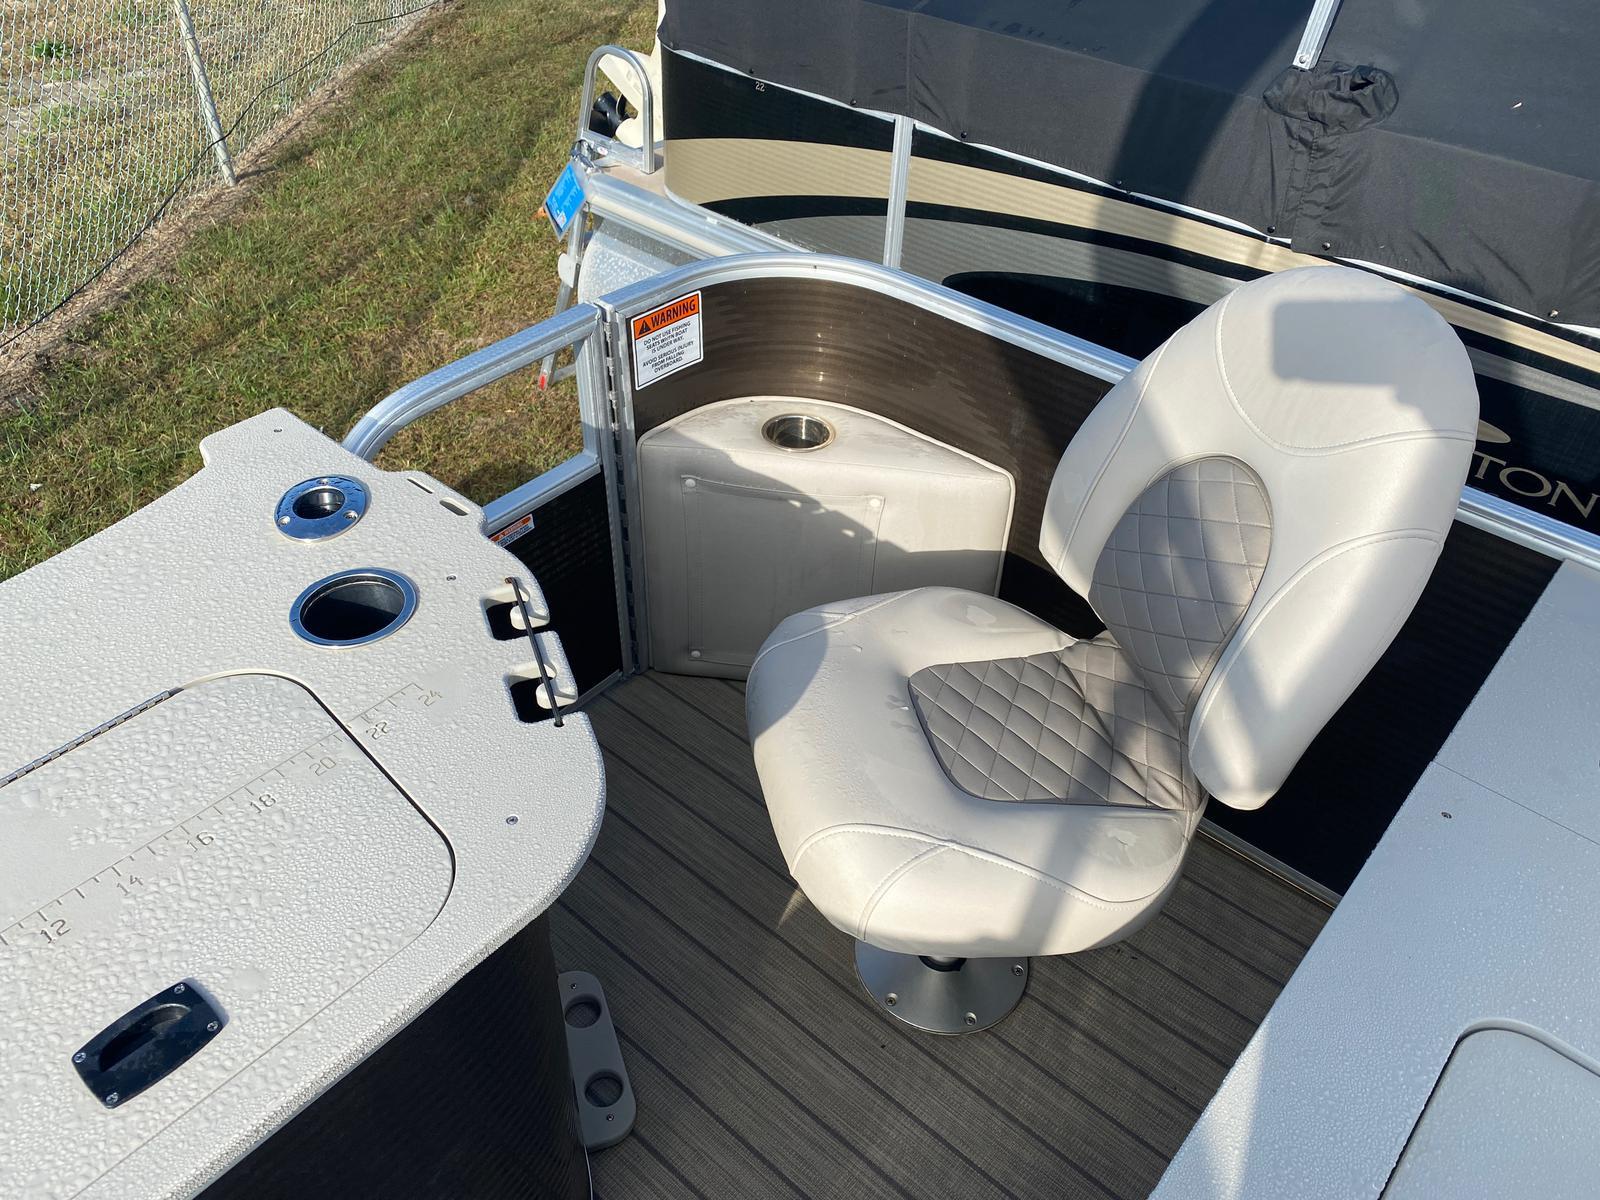 2018 Bennington boat for sale, model of the boat is 22 SSX Pontoon & Image # 11 of 13